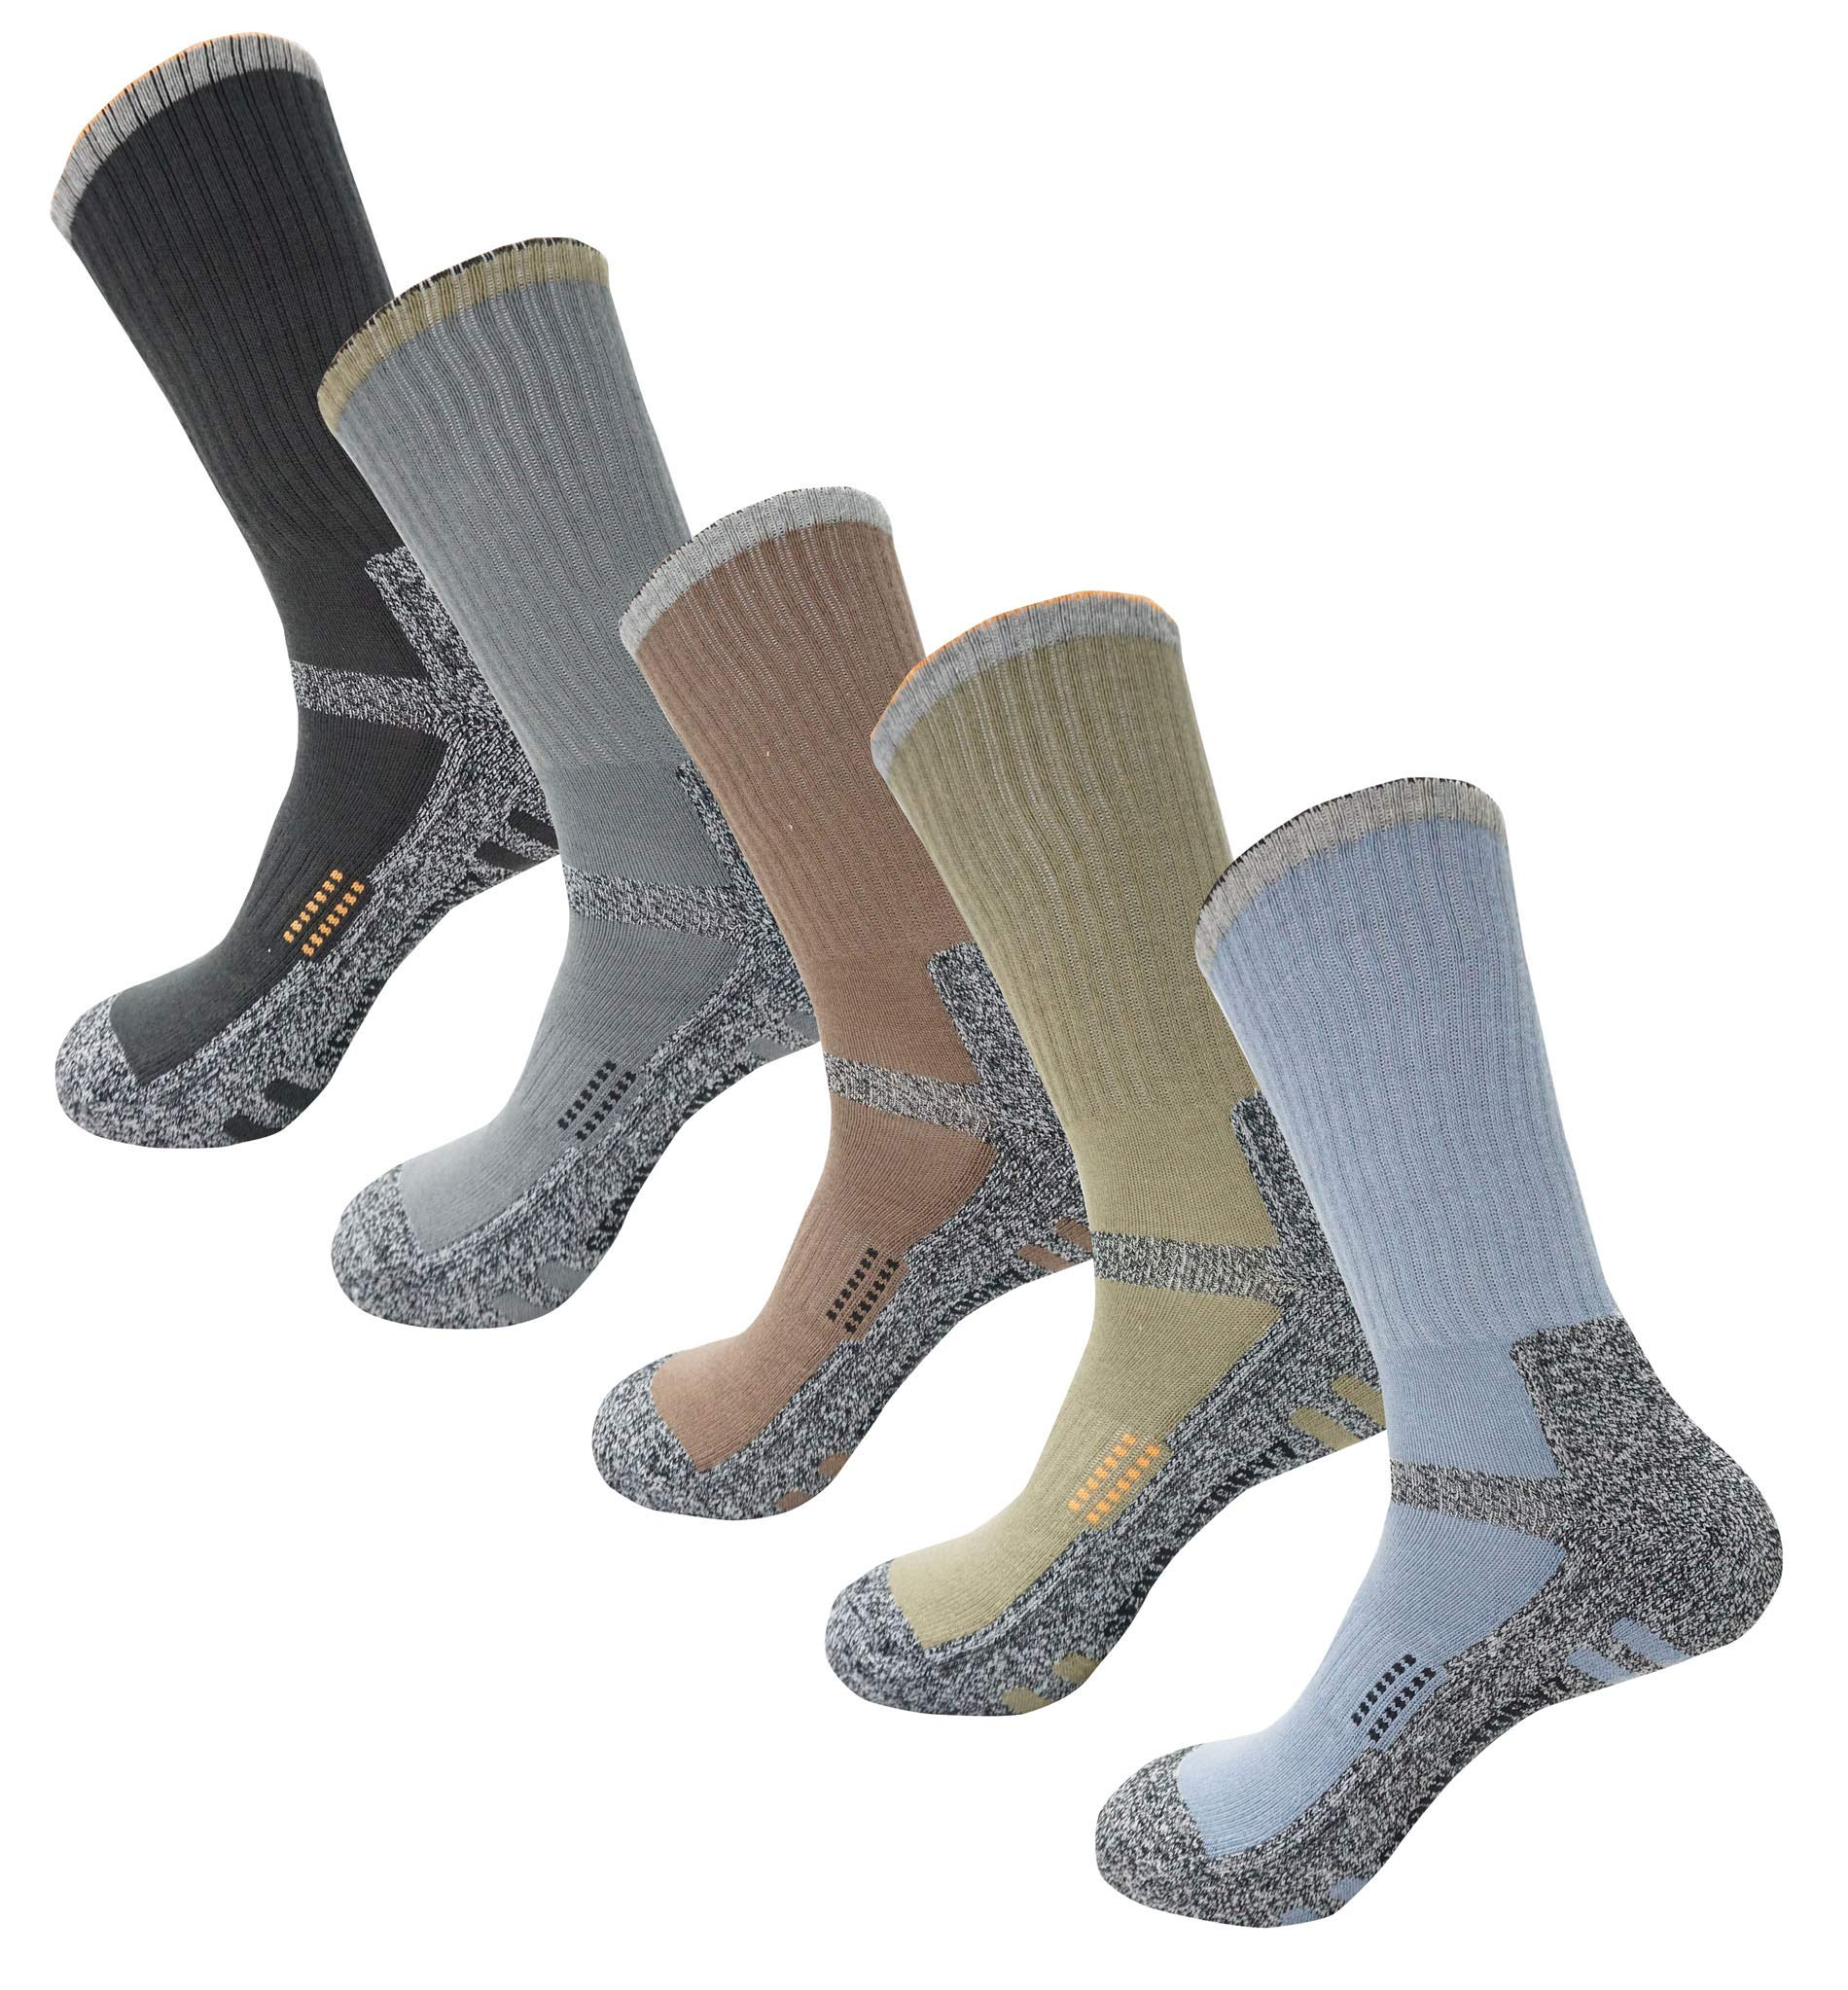 SEOULSTORY7 5Pack Men's Bio Climbing DryCool Cushion Hiking/Performance Crew Socks 5Pair New Design3 Khaki Included L3 by SEOULSTORY7